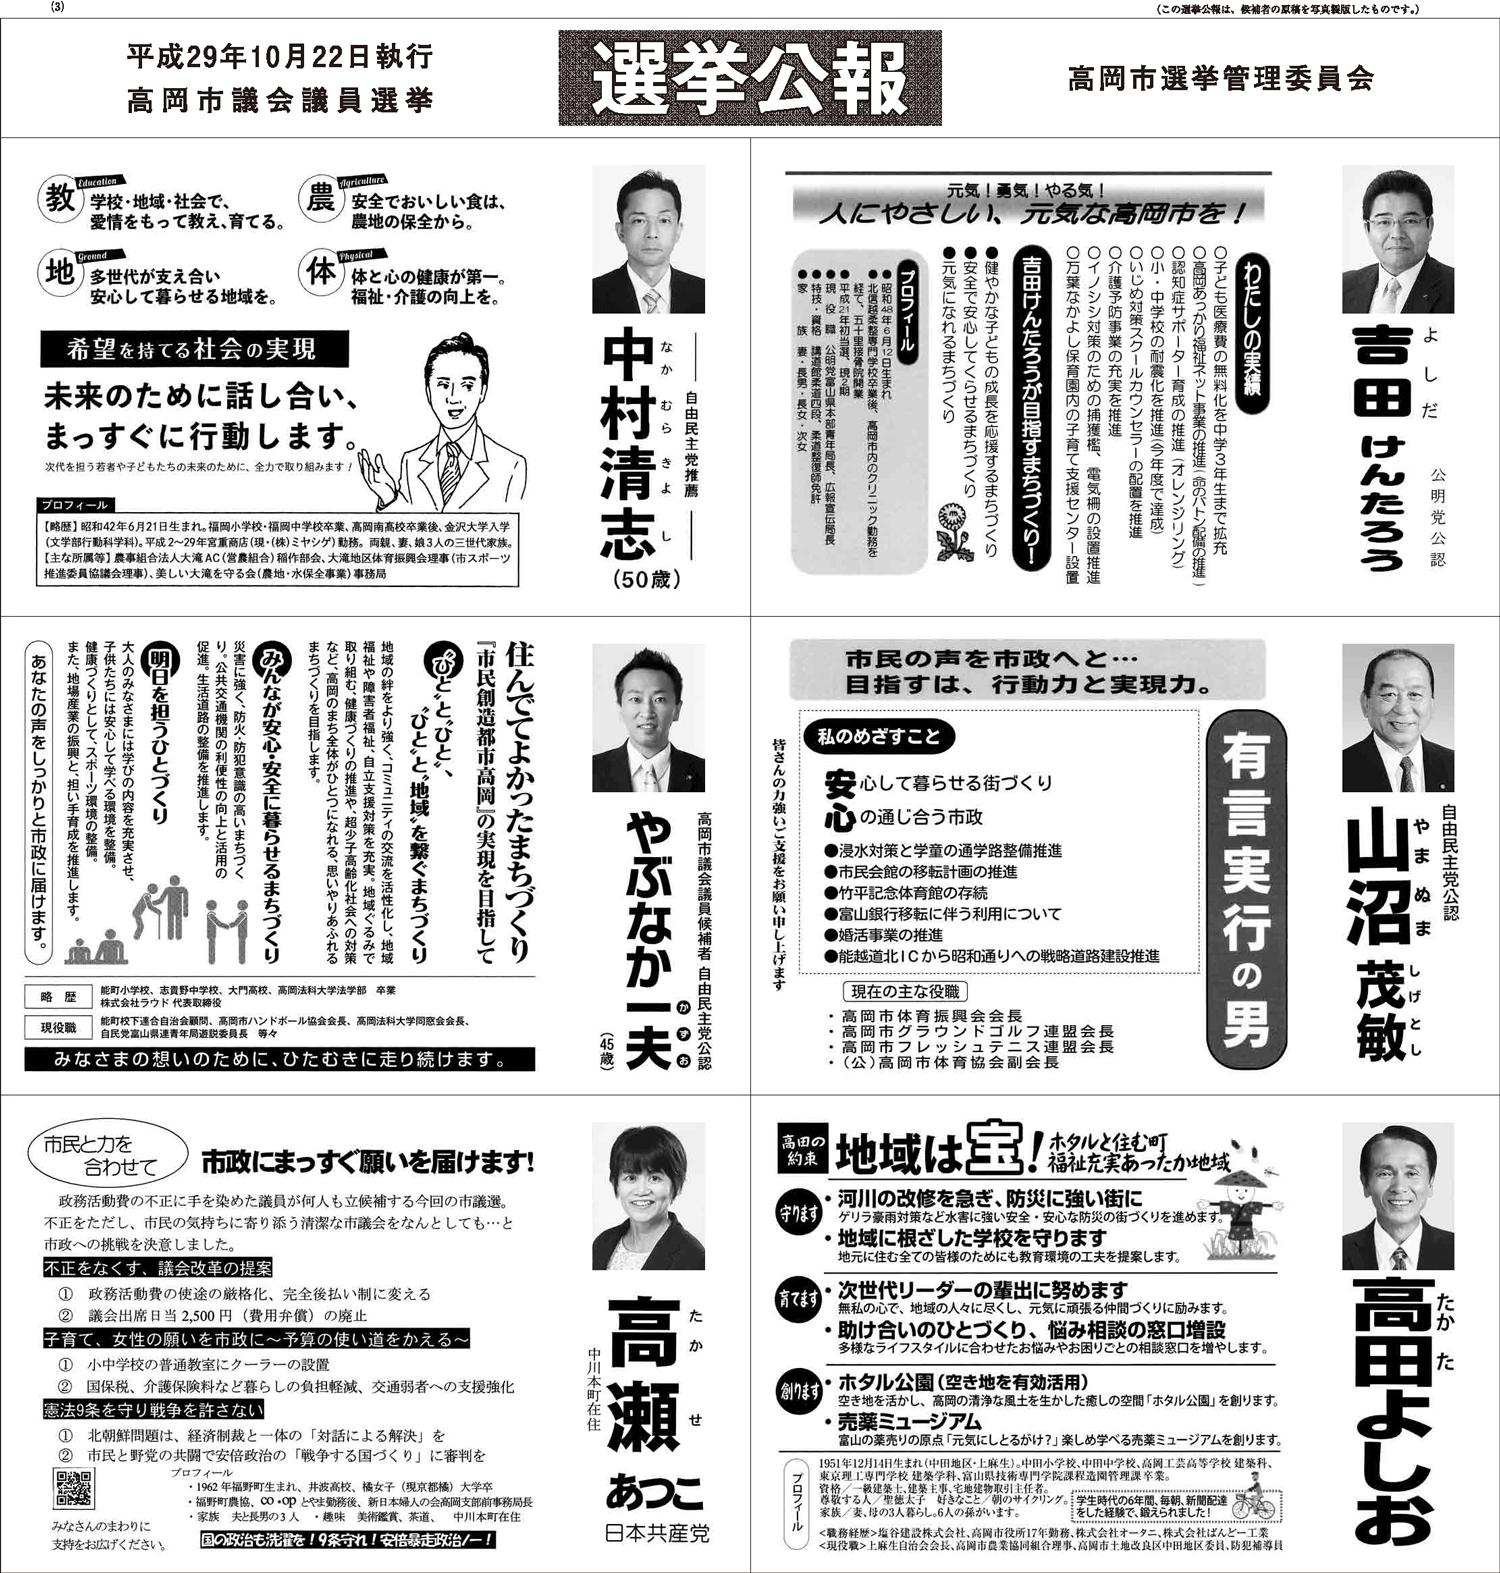 高岡市議会議員選挙2017の選挙公報3